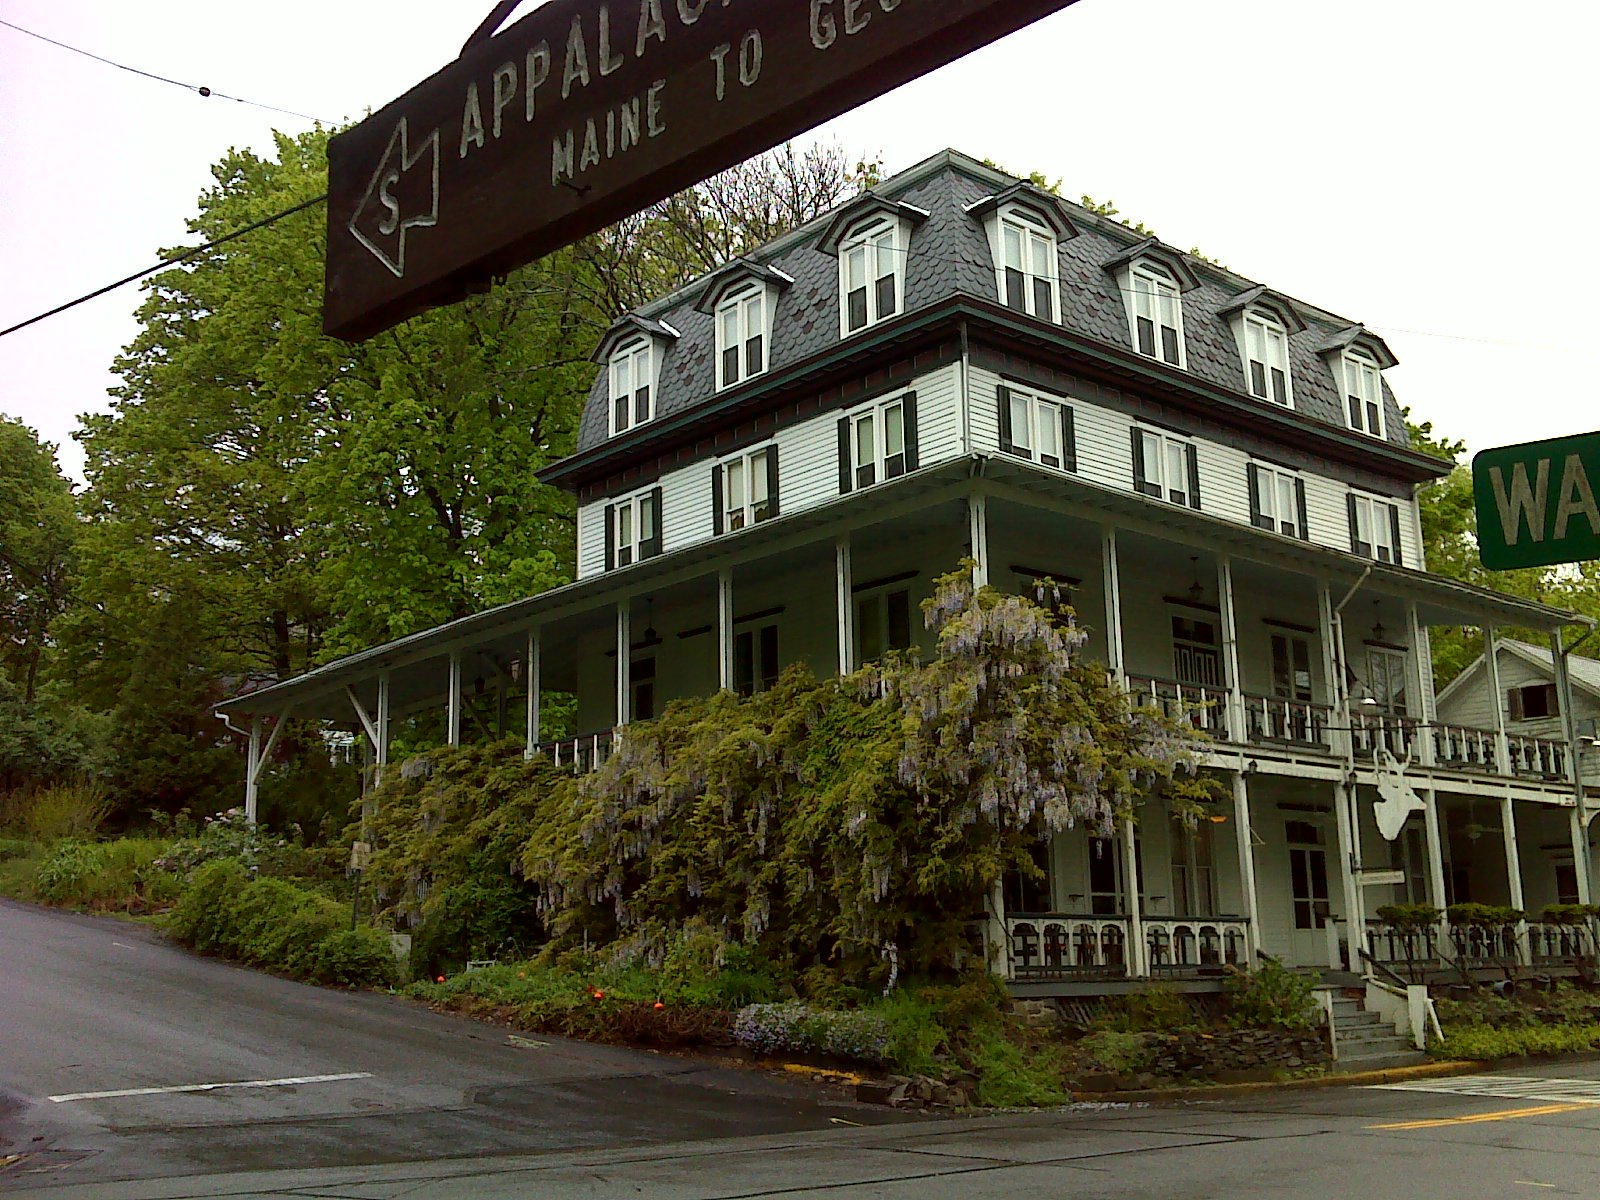 The Deer Head Inn